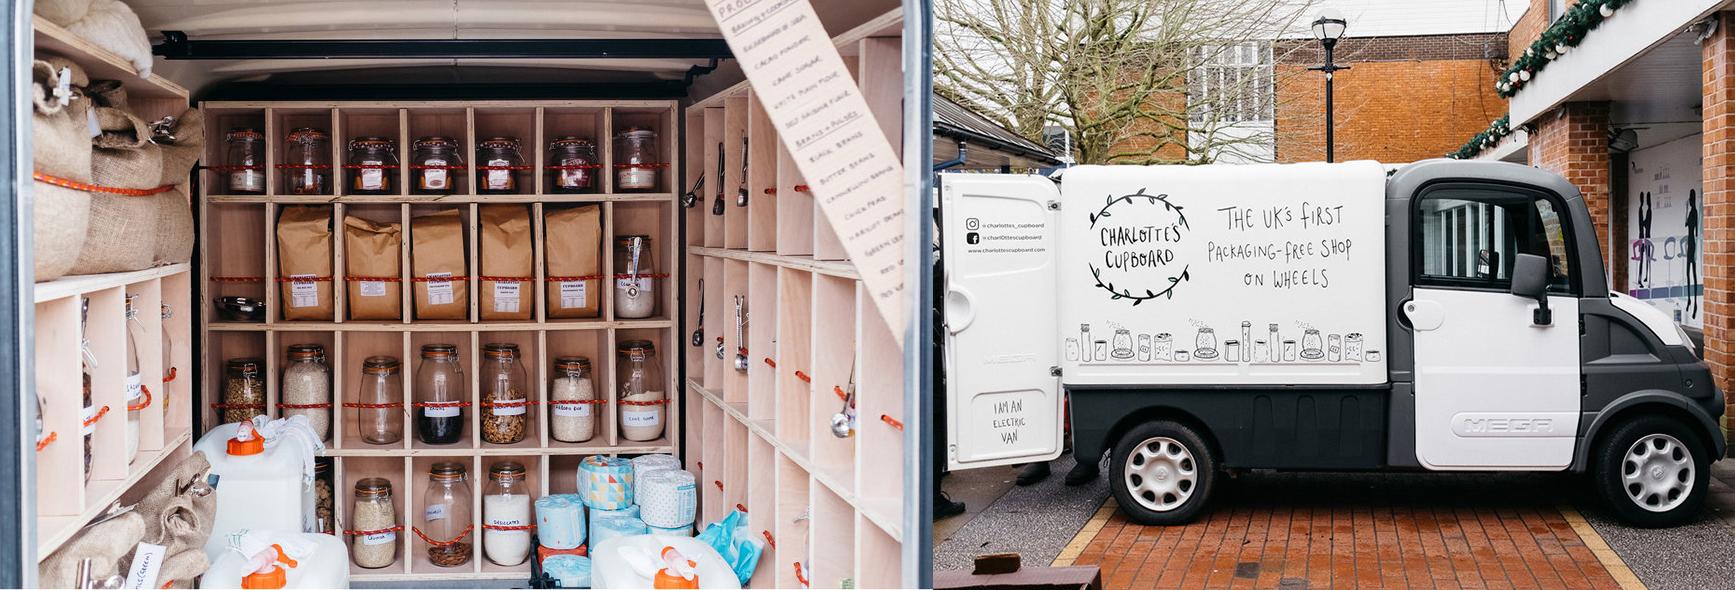 charlotte's cupboard